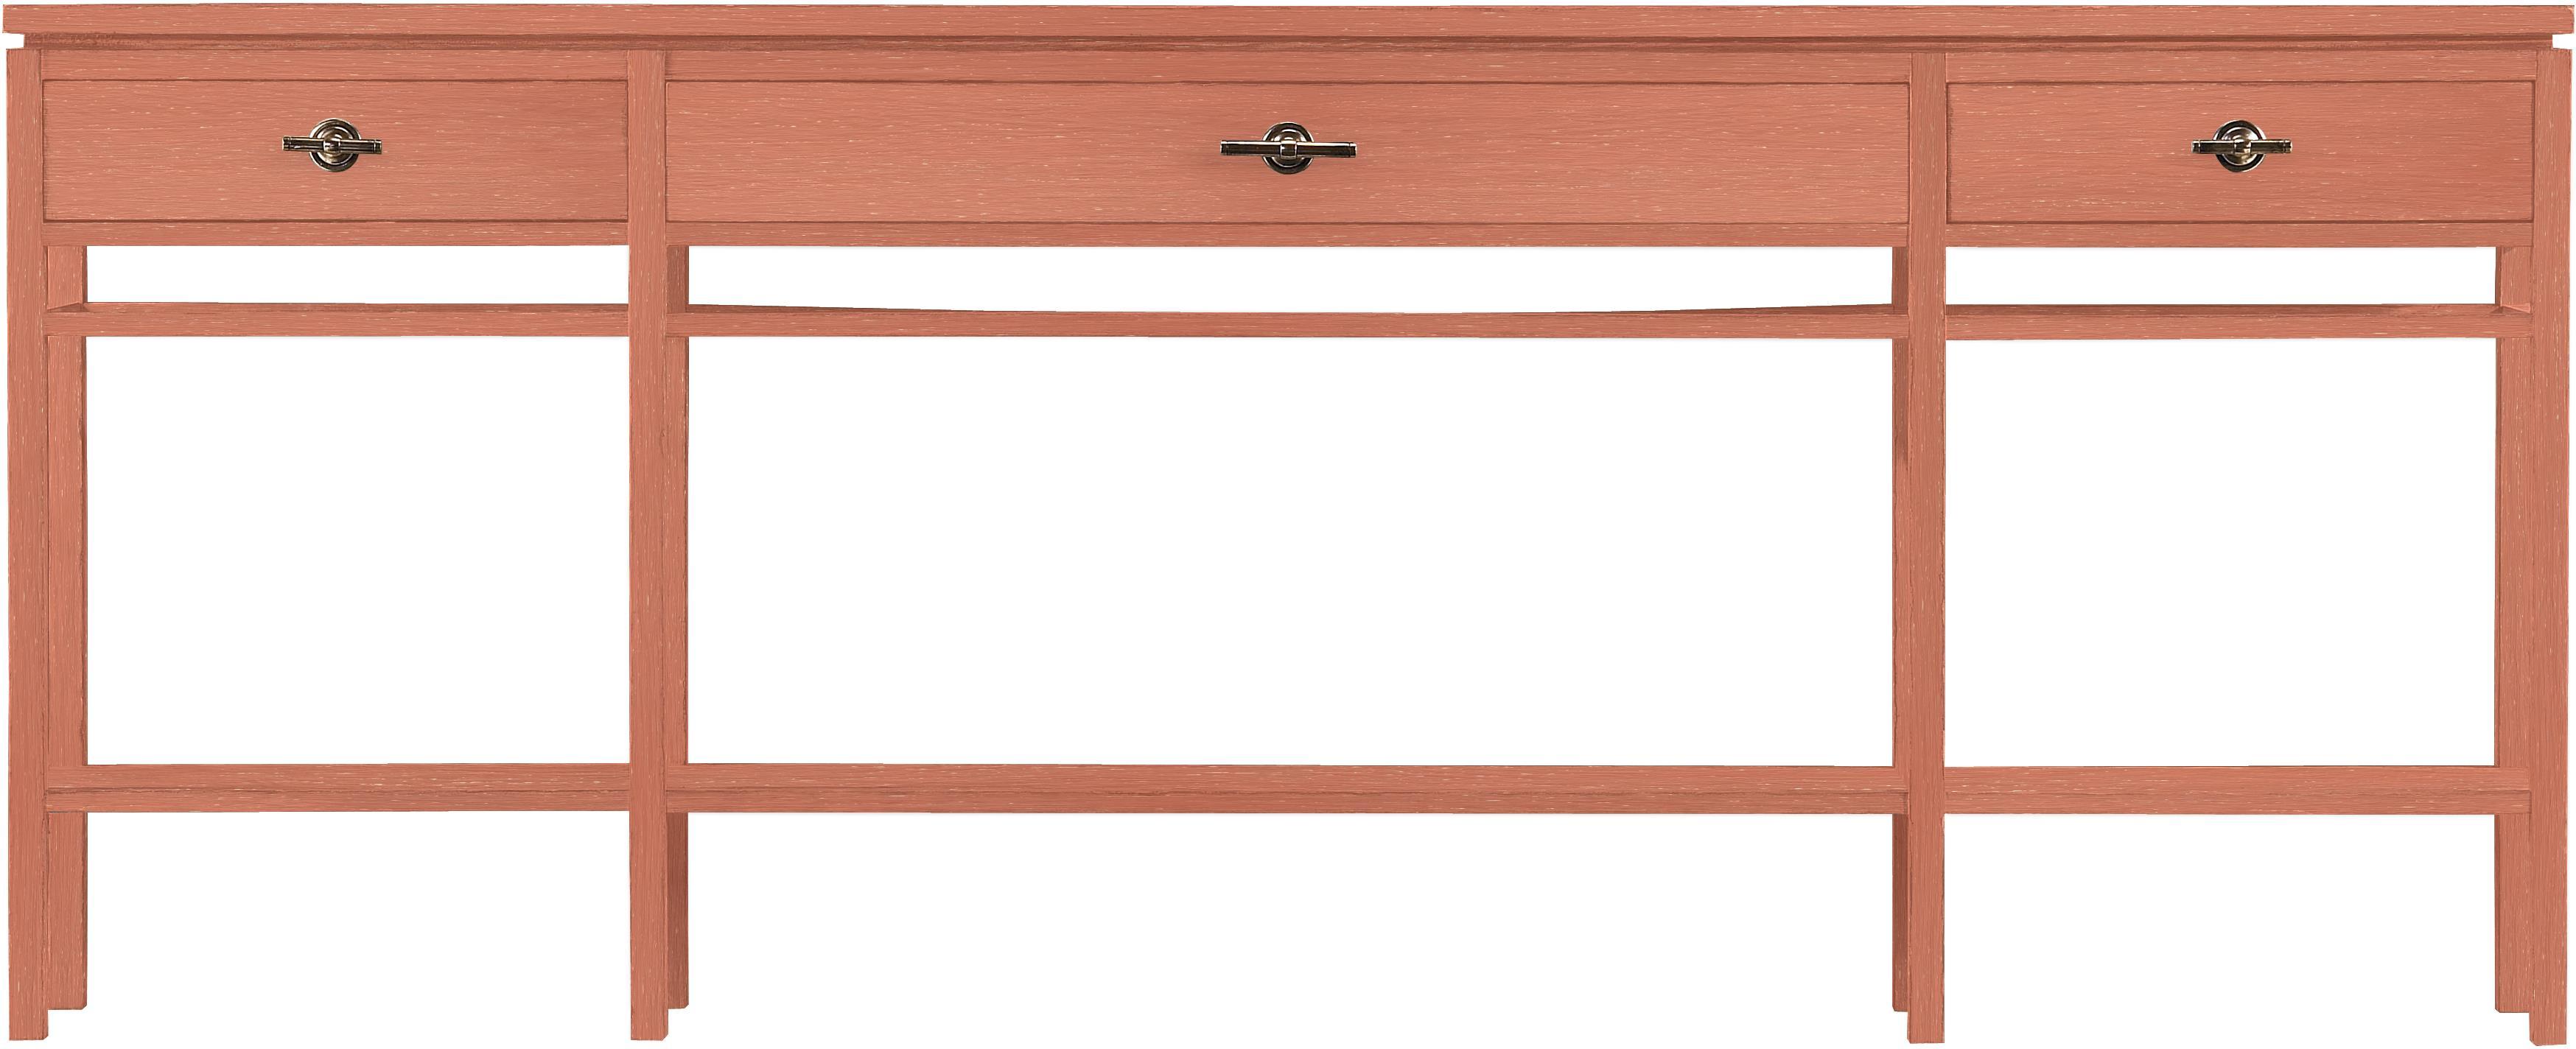 Stanley Furniture Coastal Living Resort Palisades Sofa Table - Item Number: 062-G5-05